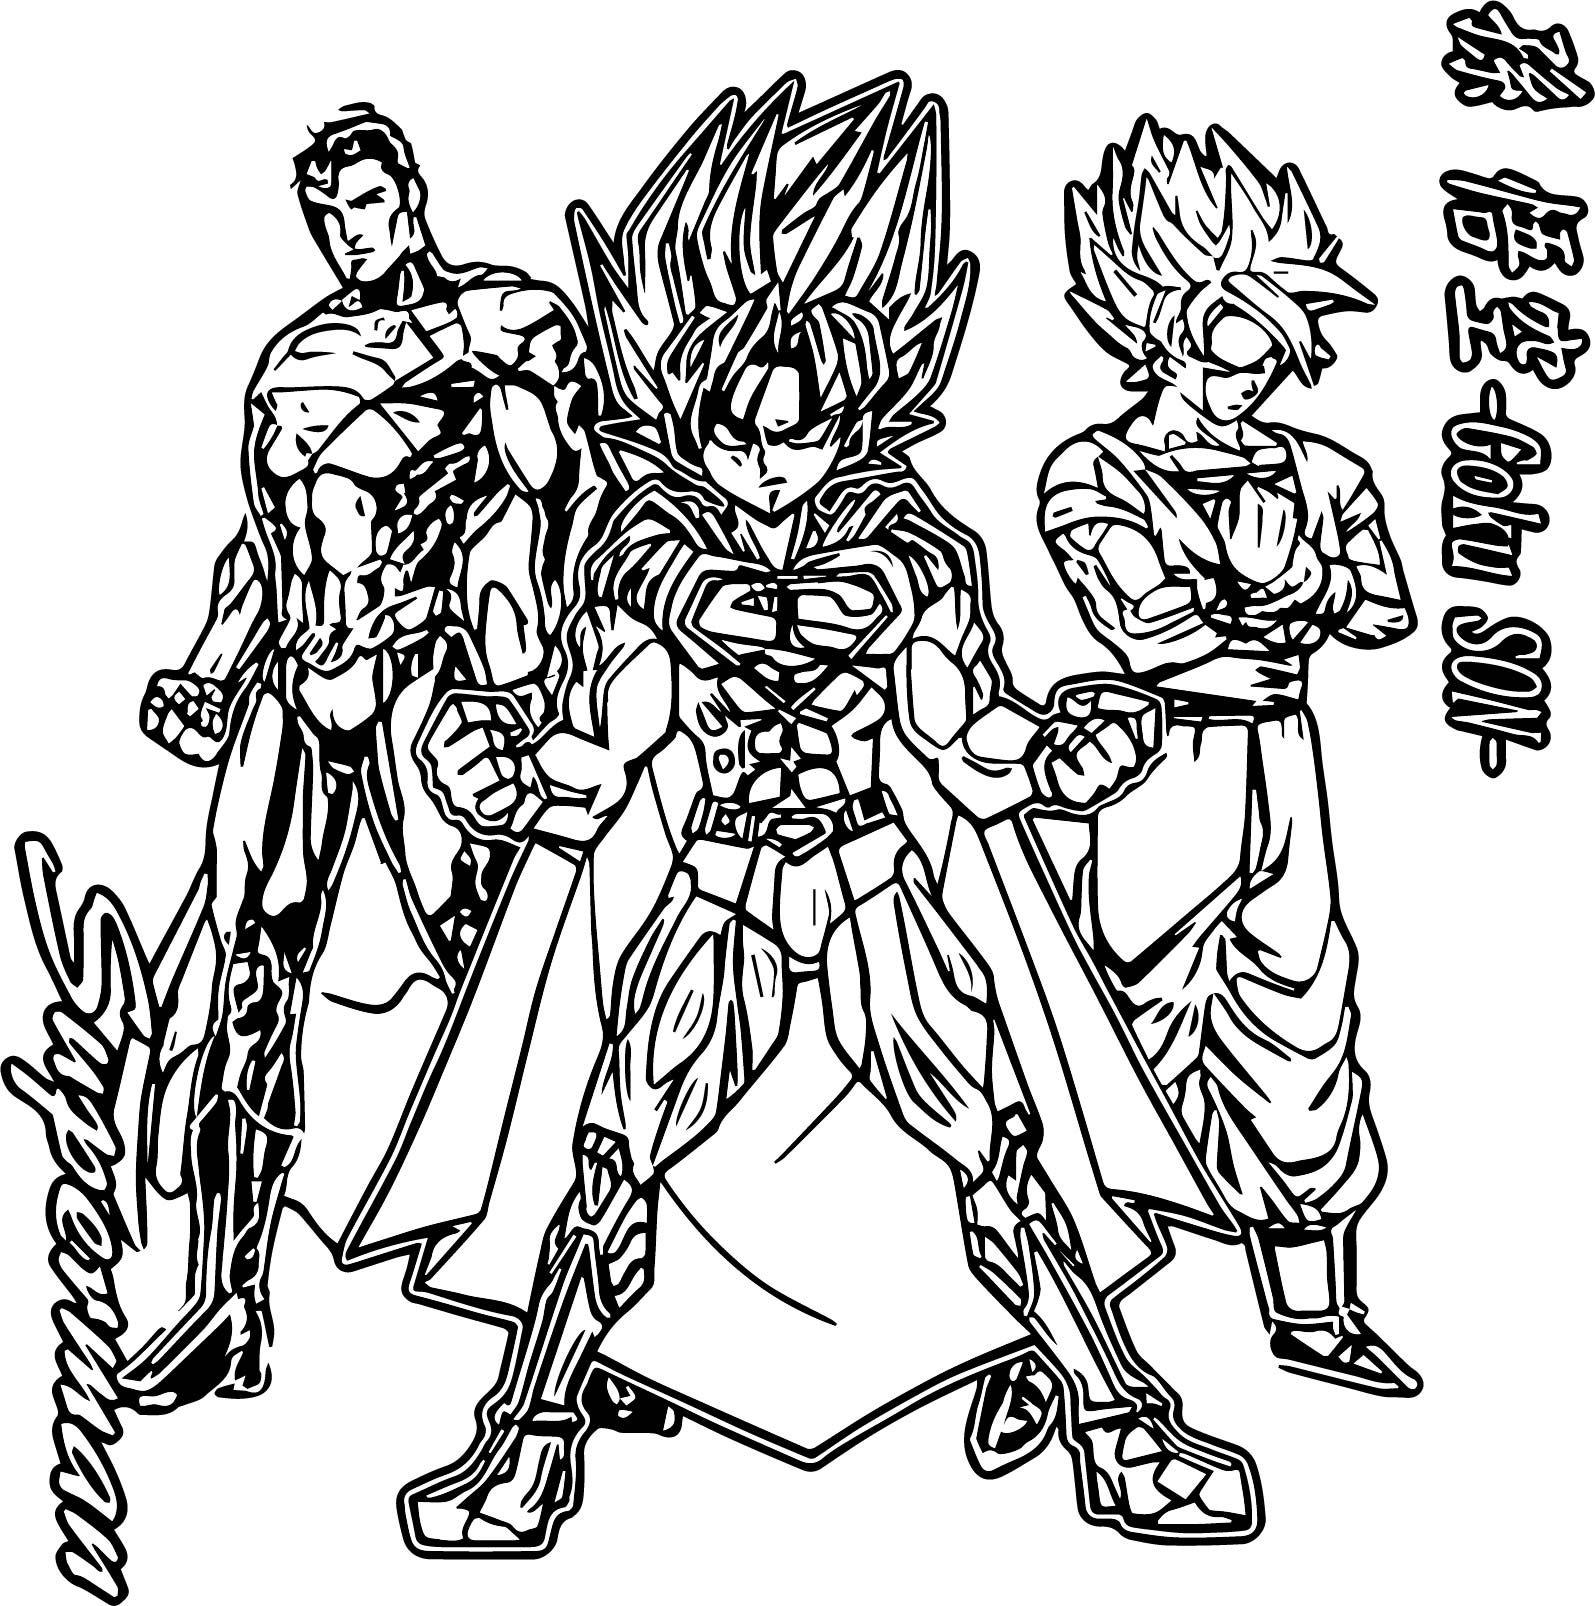 Cool Goku Superman Coloring Page Superman Coloring Pages Cartoon Crossovers Coloring Pages